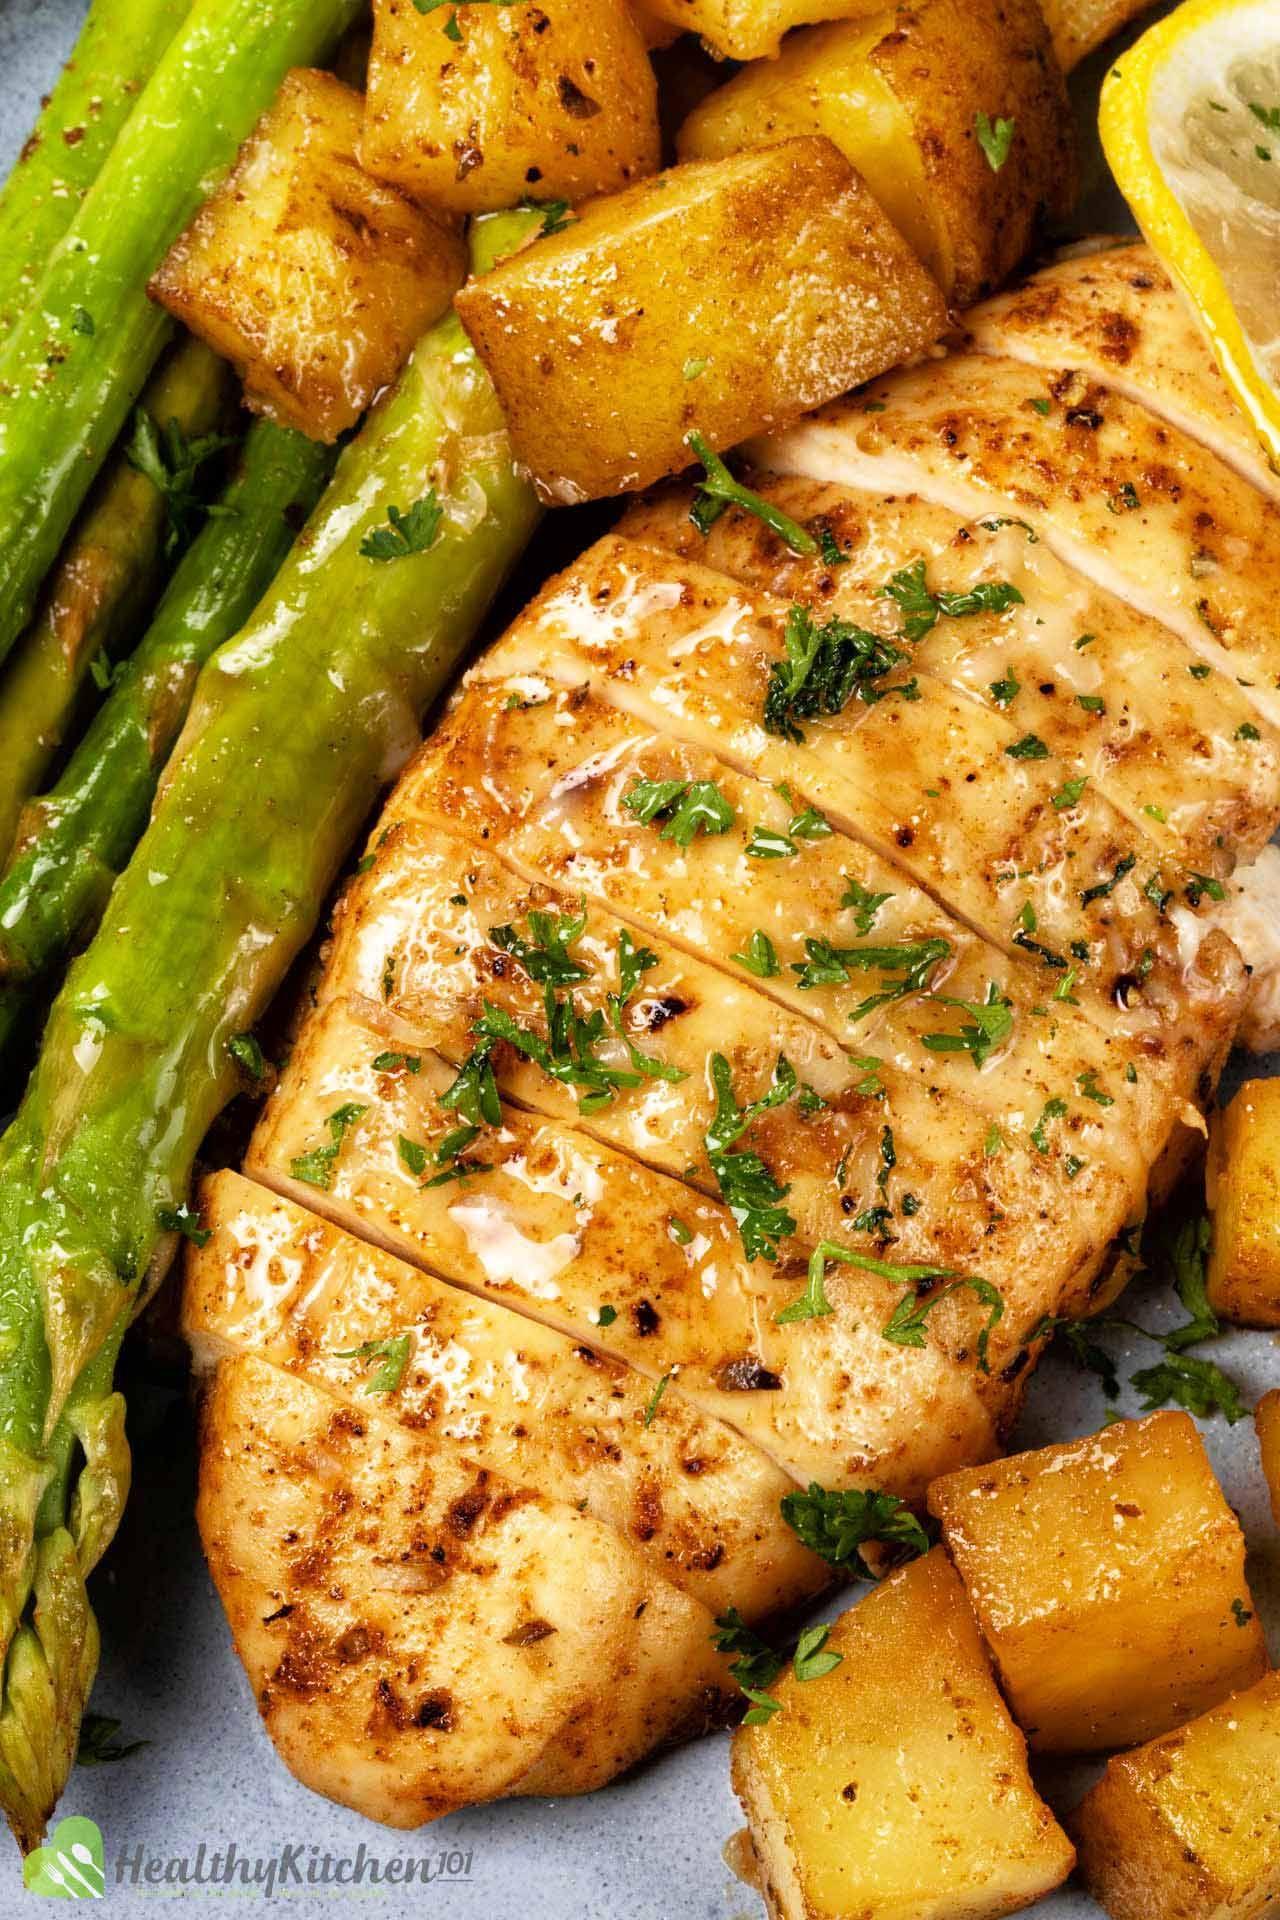 Healthy Baked Chicken Breast Recipe Healthy Recipes 101